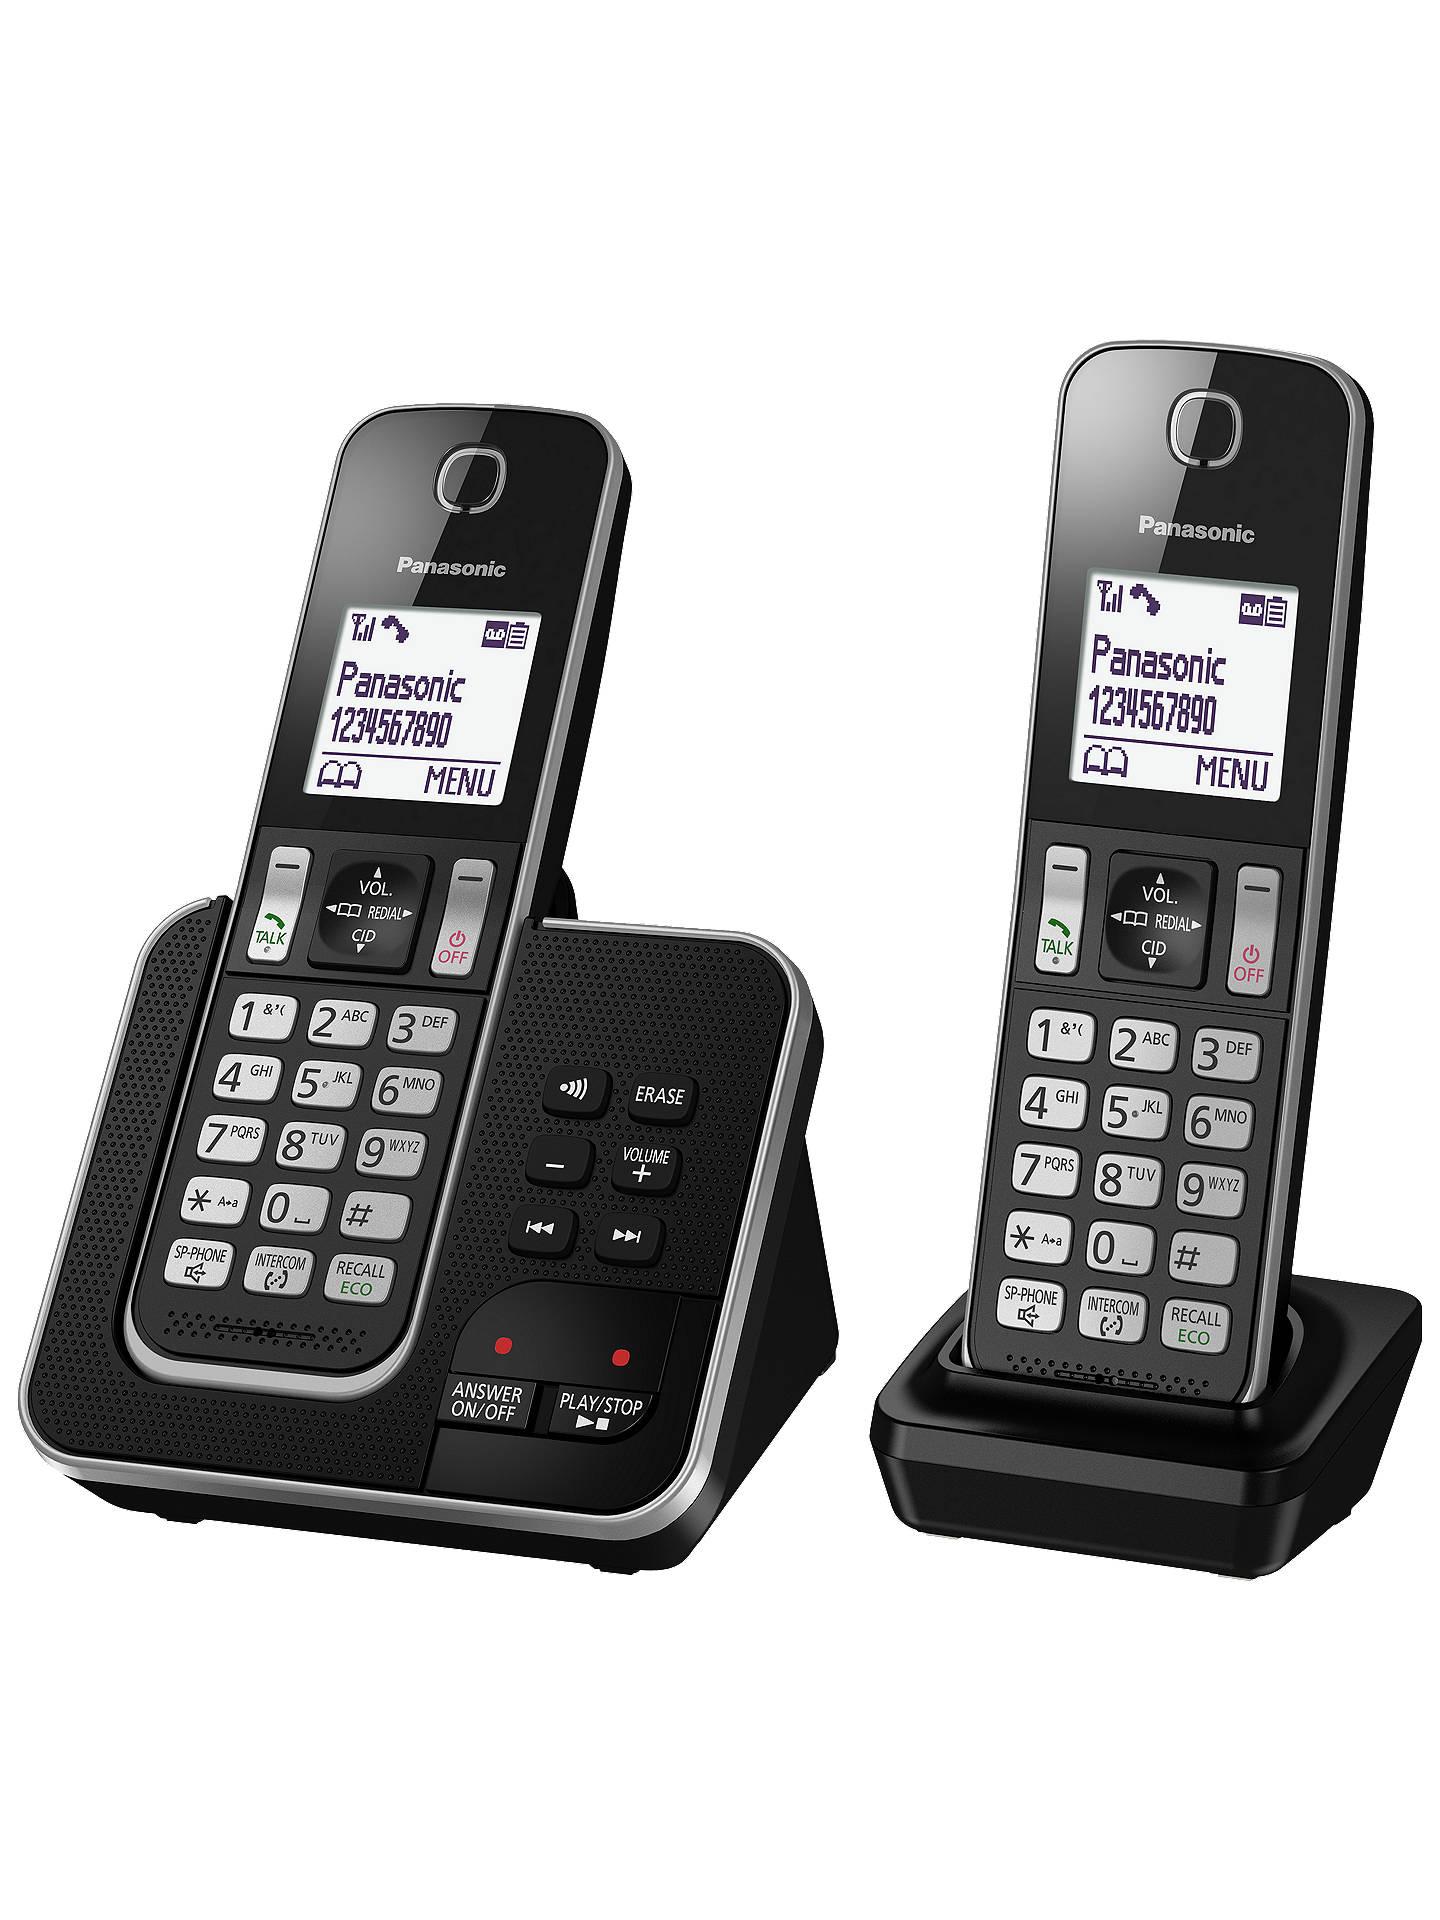 Panasonic Kx Tgd322eb Digital Cordless Phone With Nuisance Call